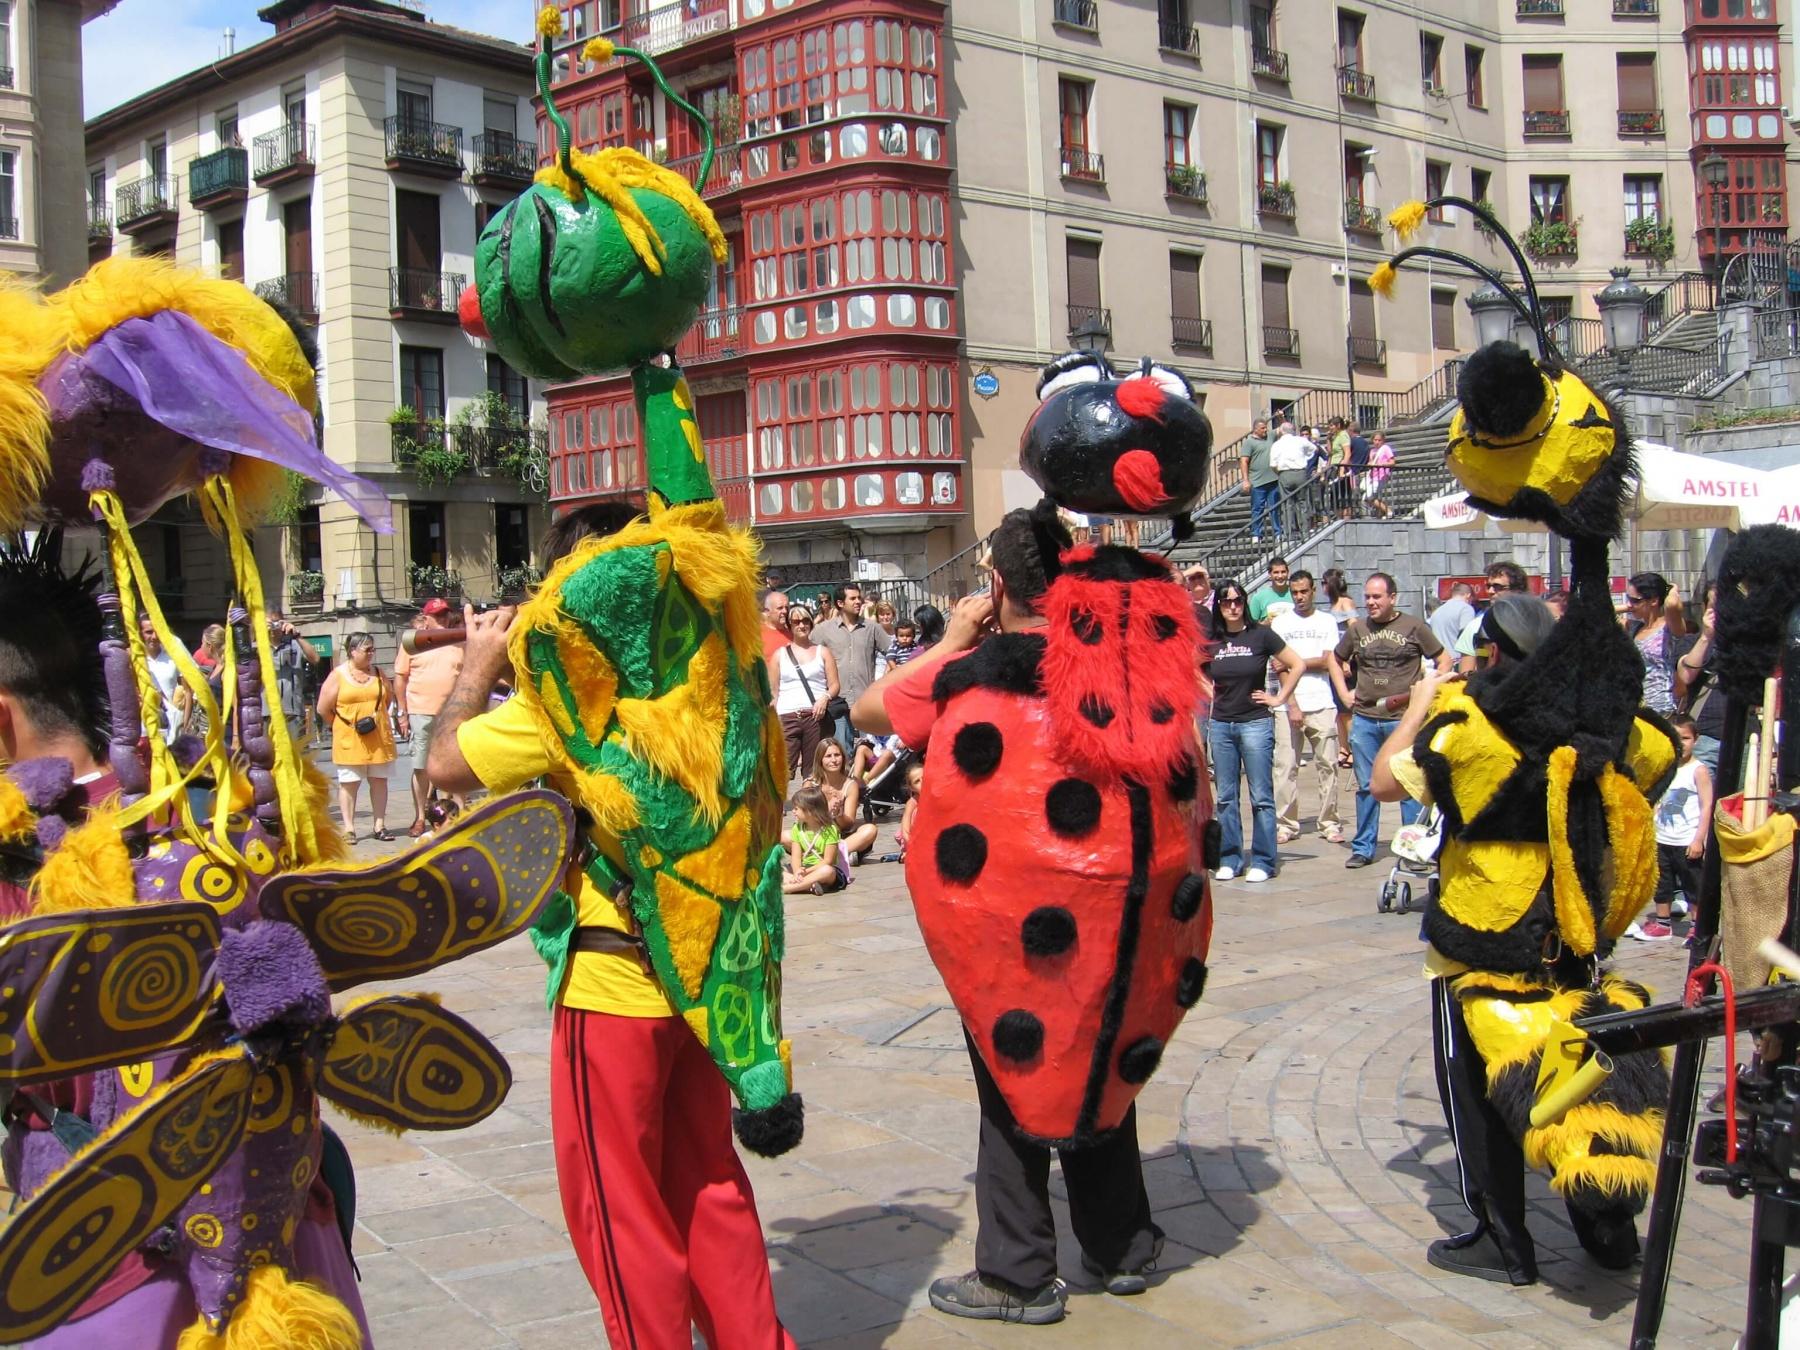 La Fanfare des Goulamas en Bestioles de la Garrigue à Bilbao